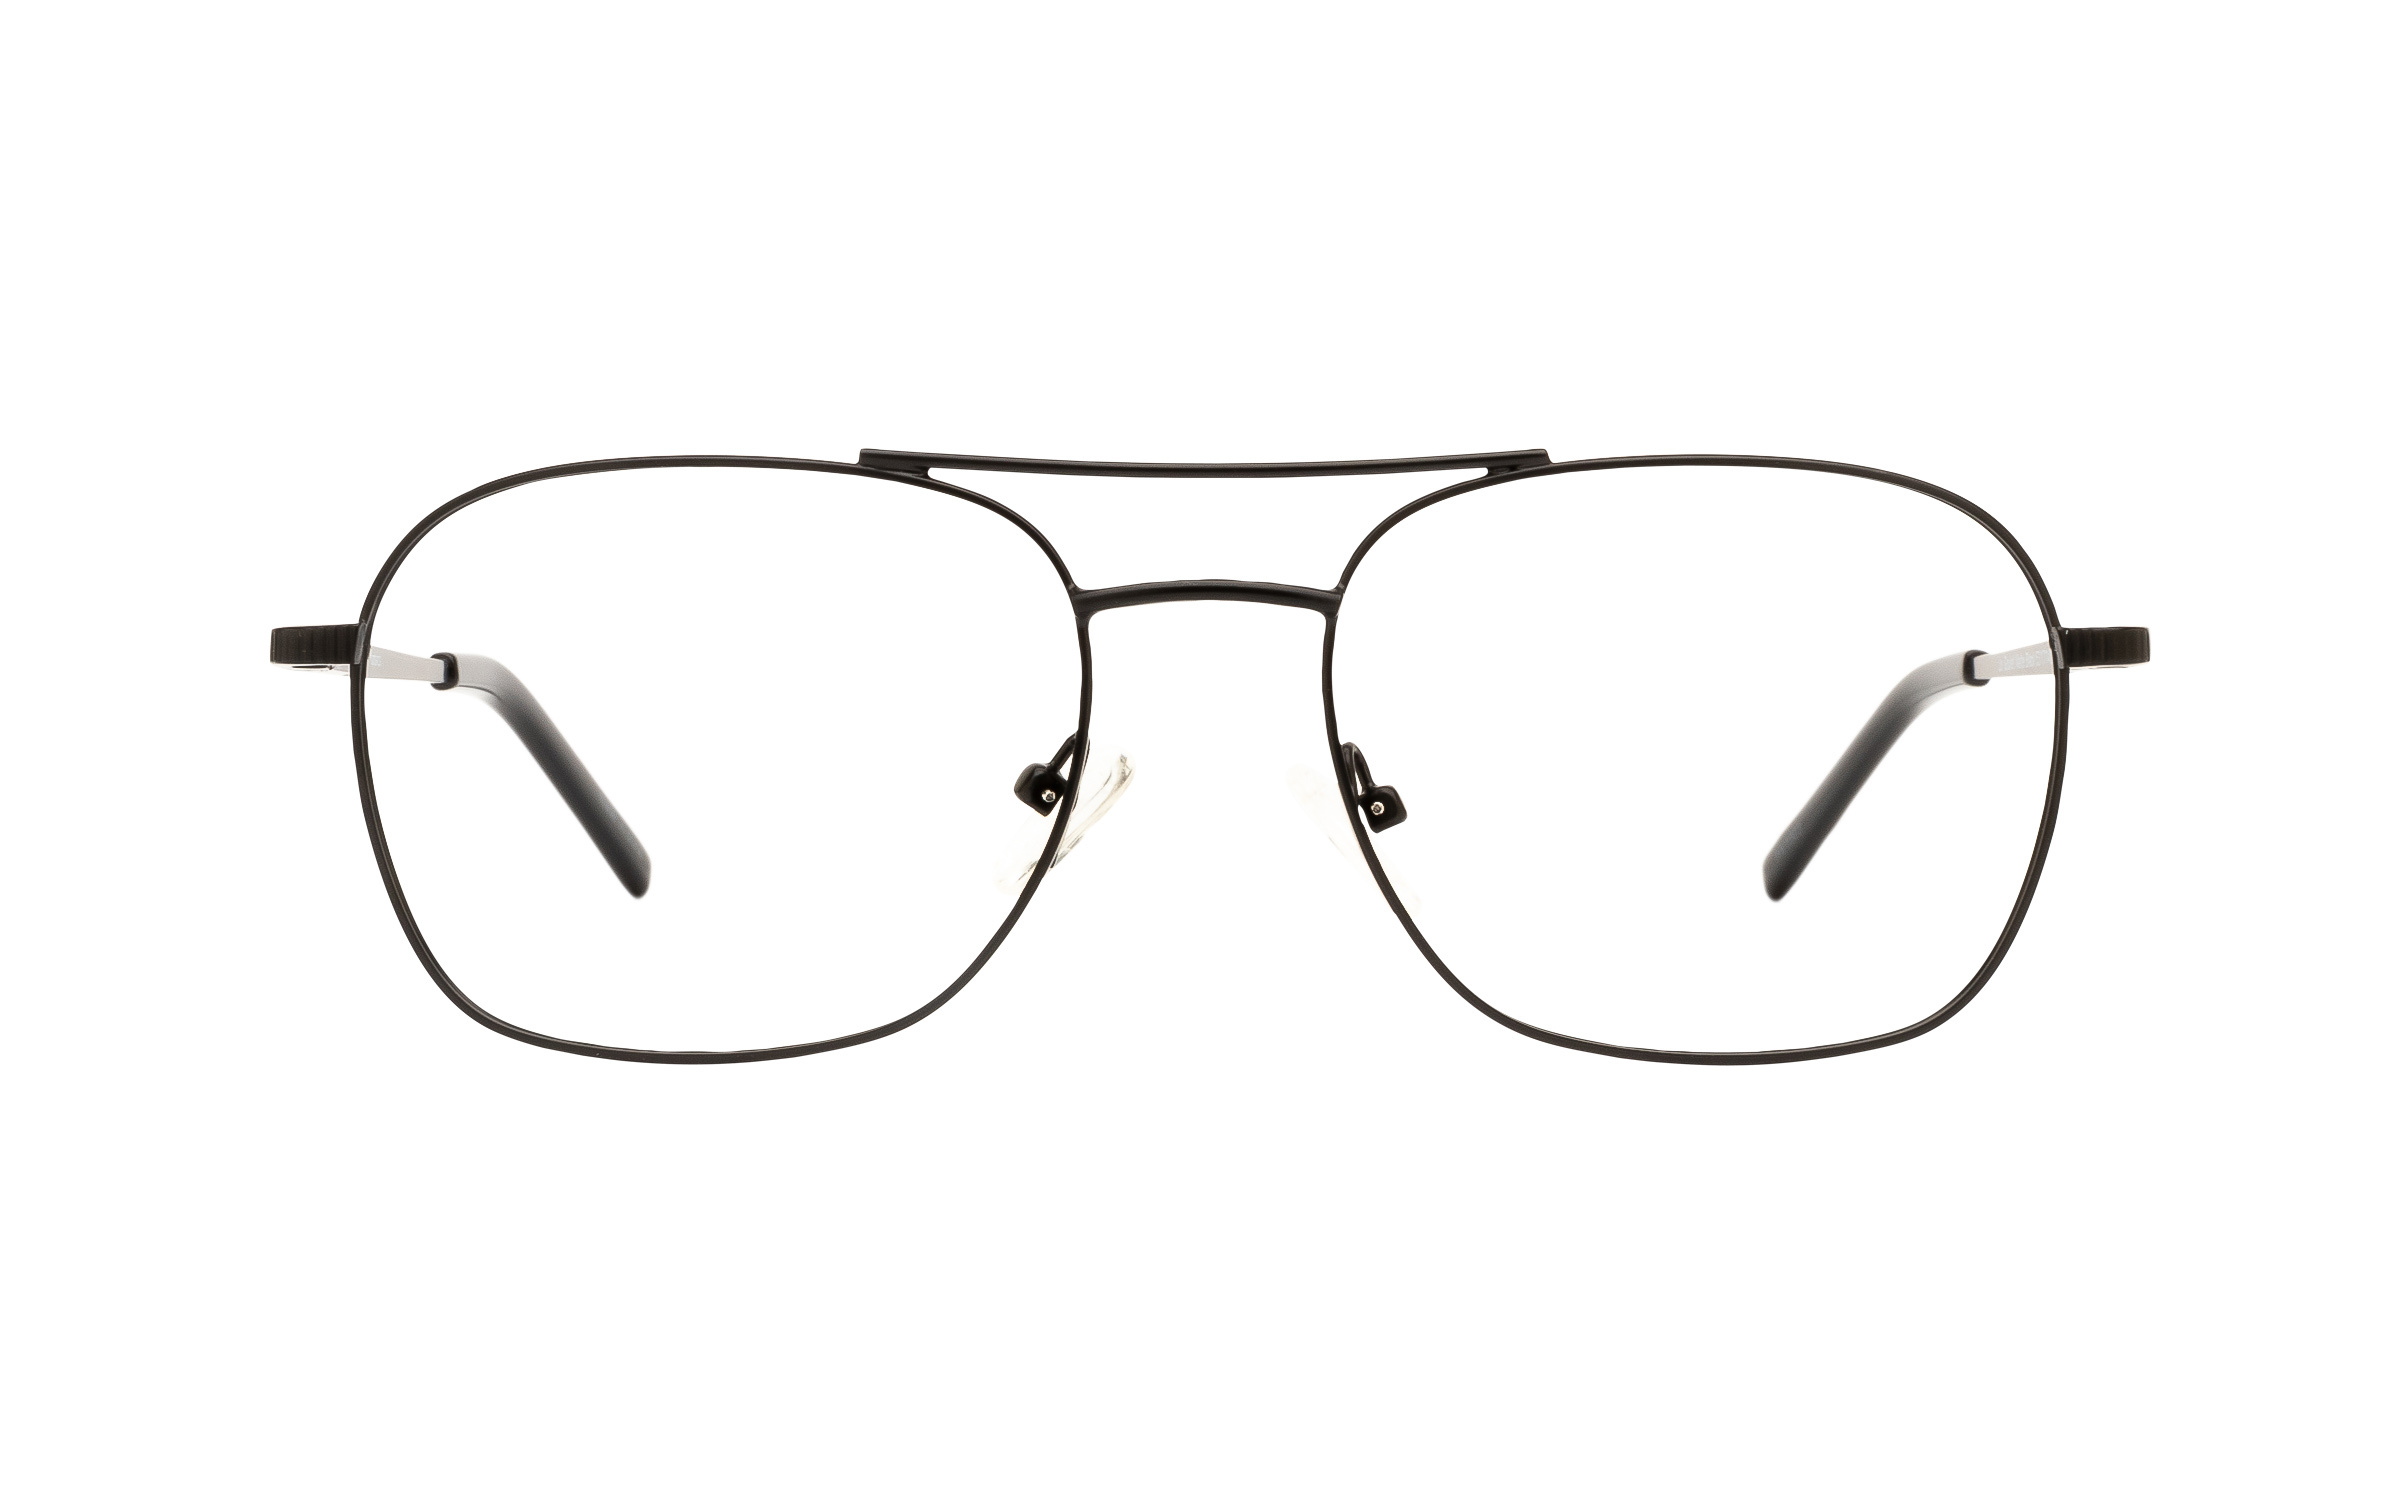 Clearly Basics Le Goulet CLS027 C01 (53) Eyeglasses and Frame in Matte Black | Metal - Online